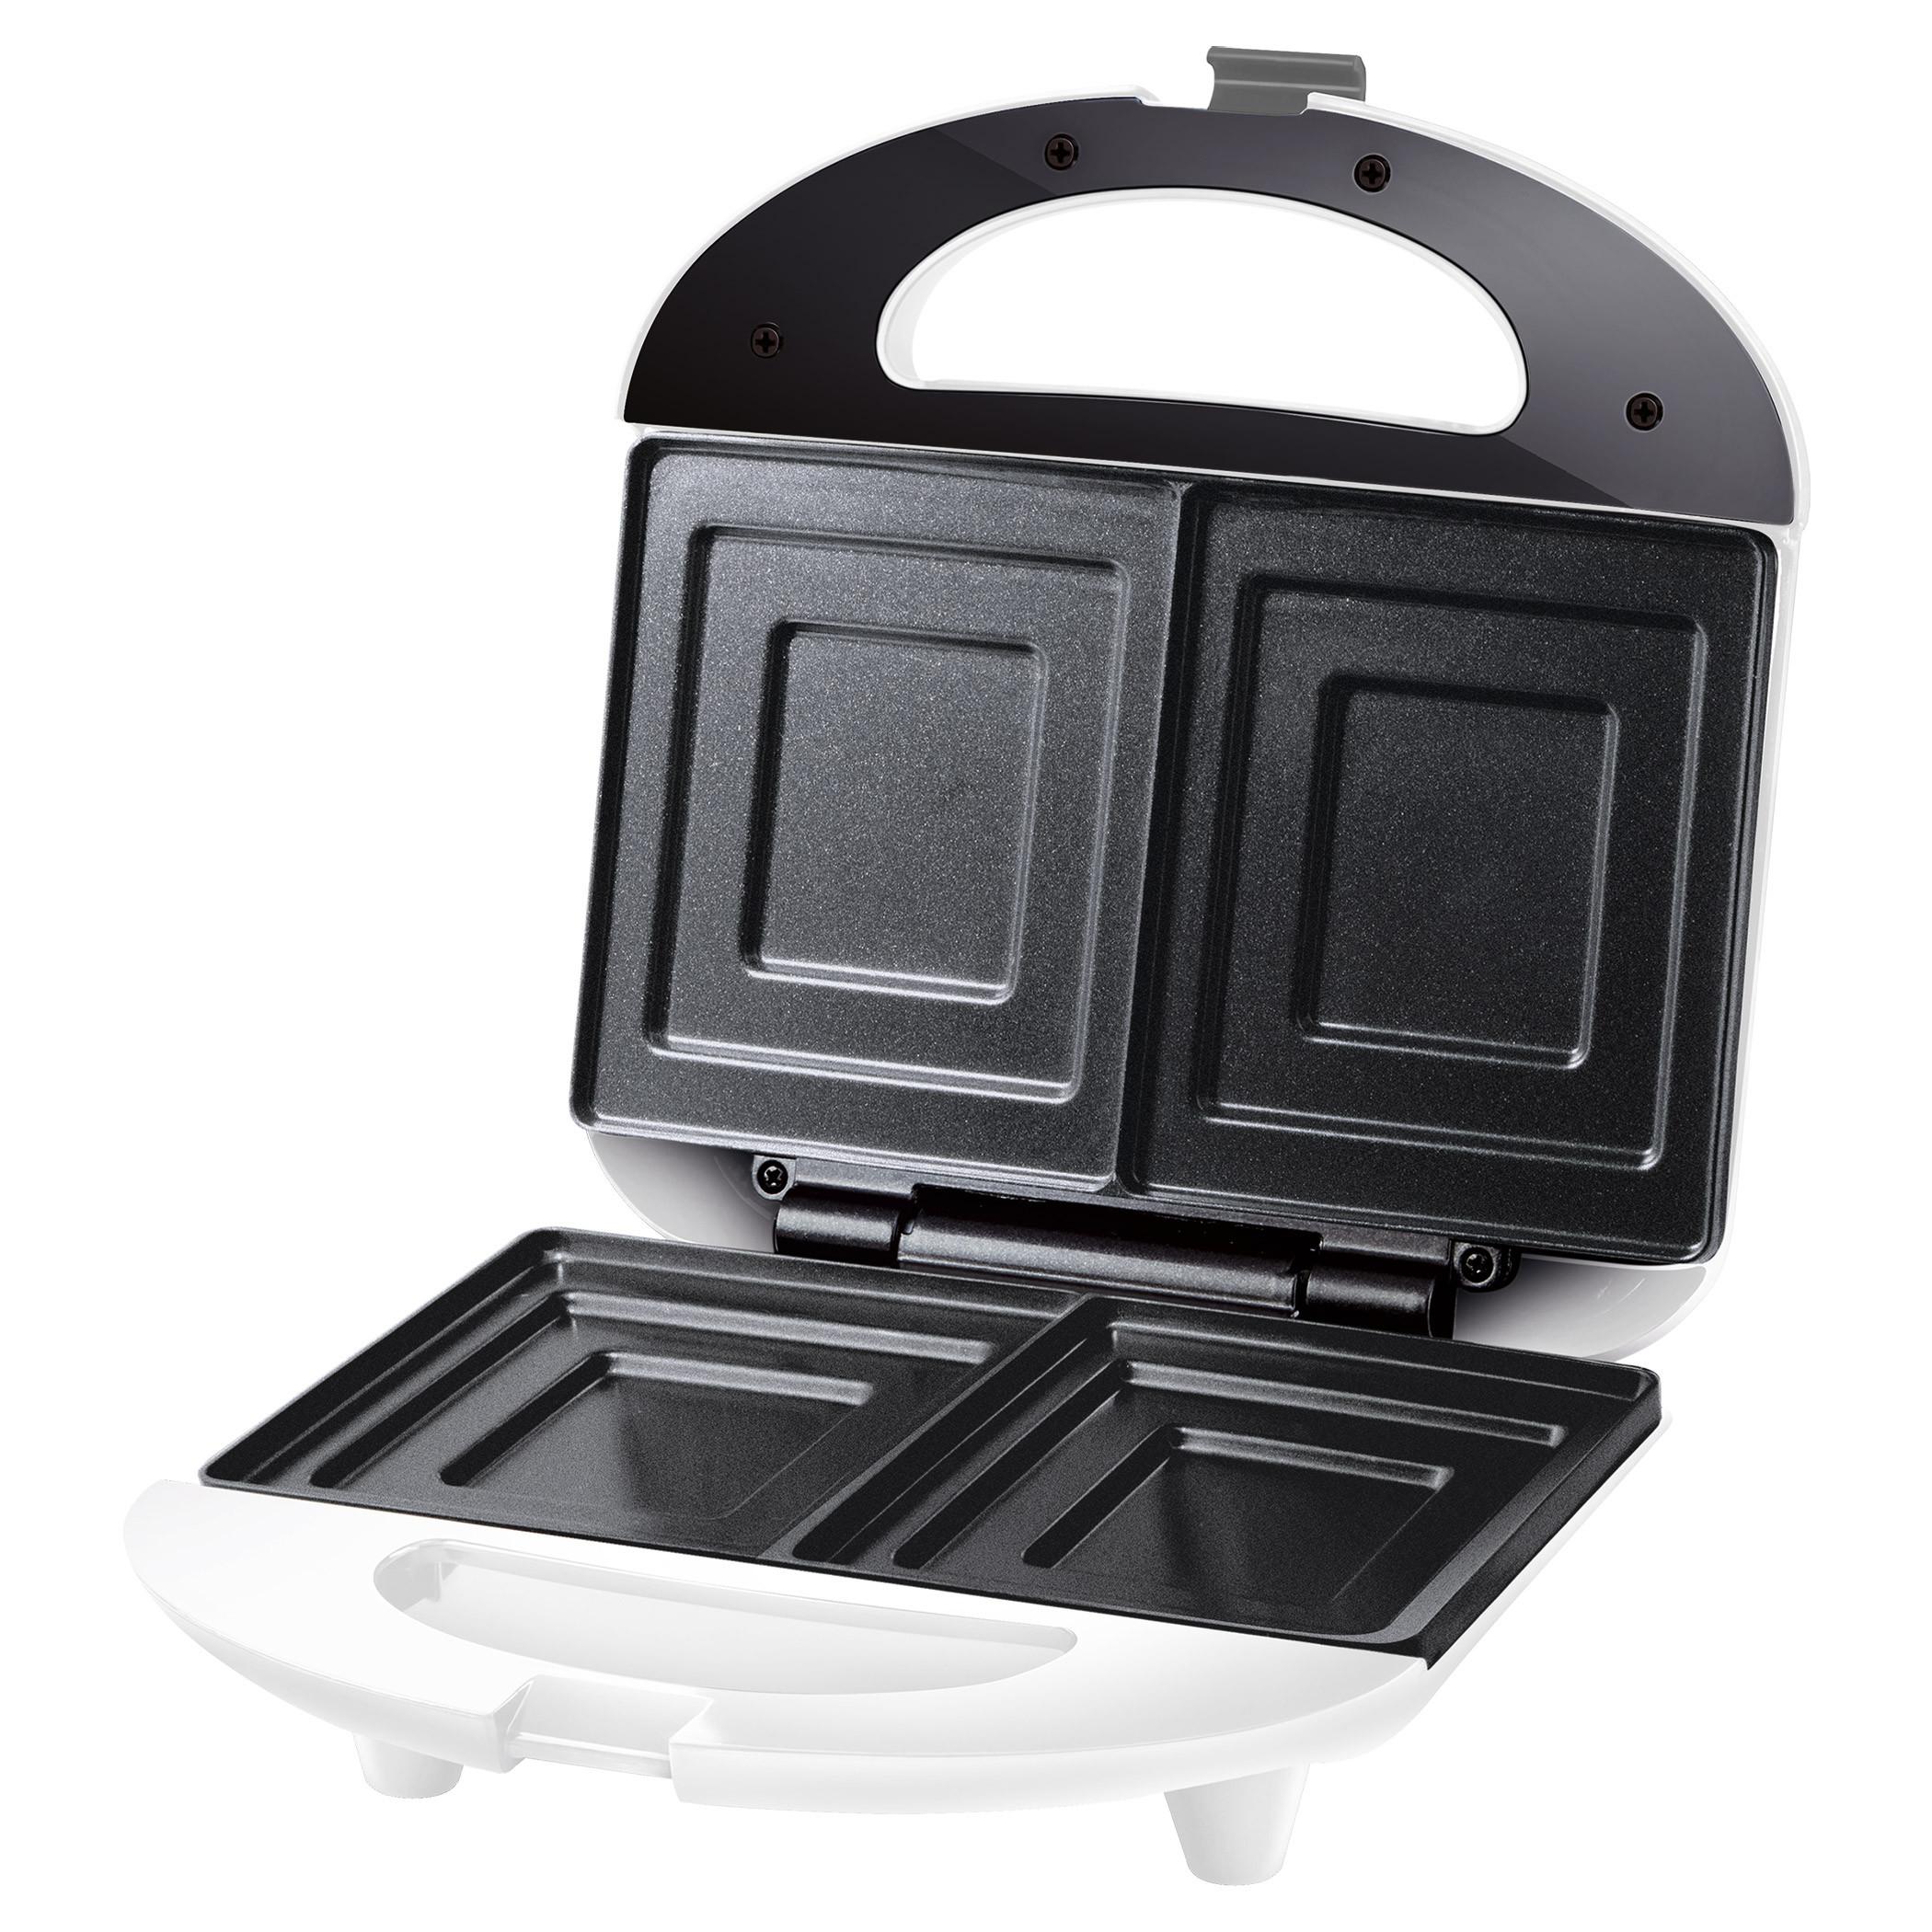 toaster trendigen im group k design tkg kupfer amazon de team dp kalorik to